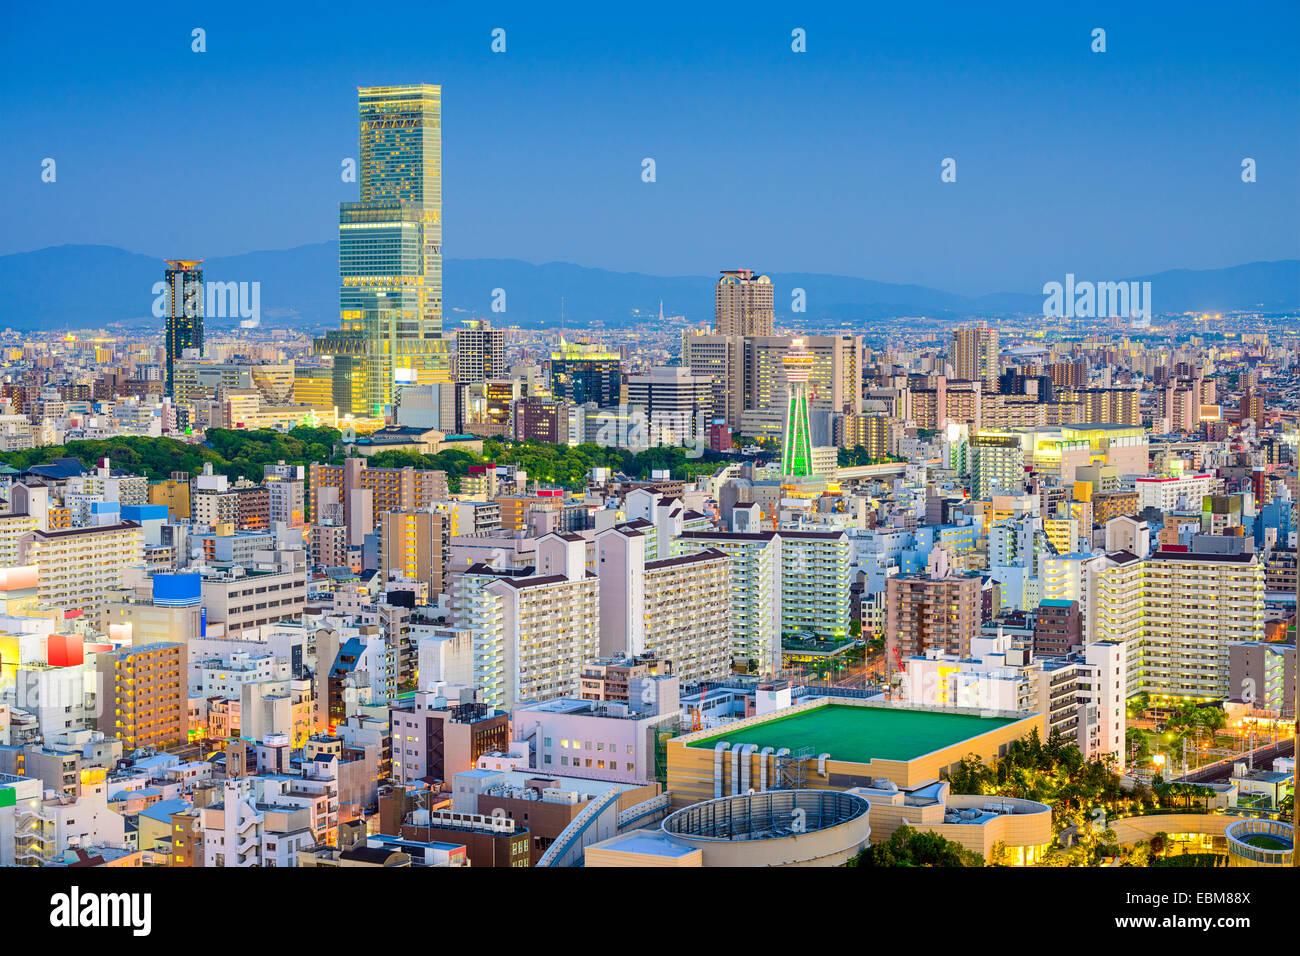 Osaka, Japan cityscape view of Abeno and Shinsekai districts. - Stock Image